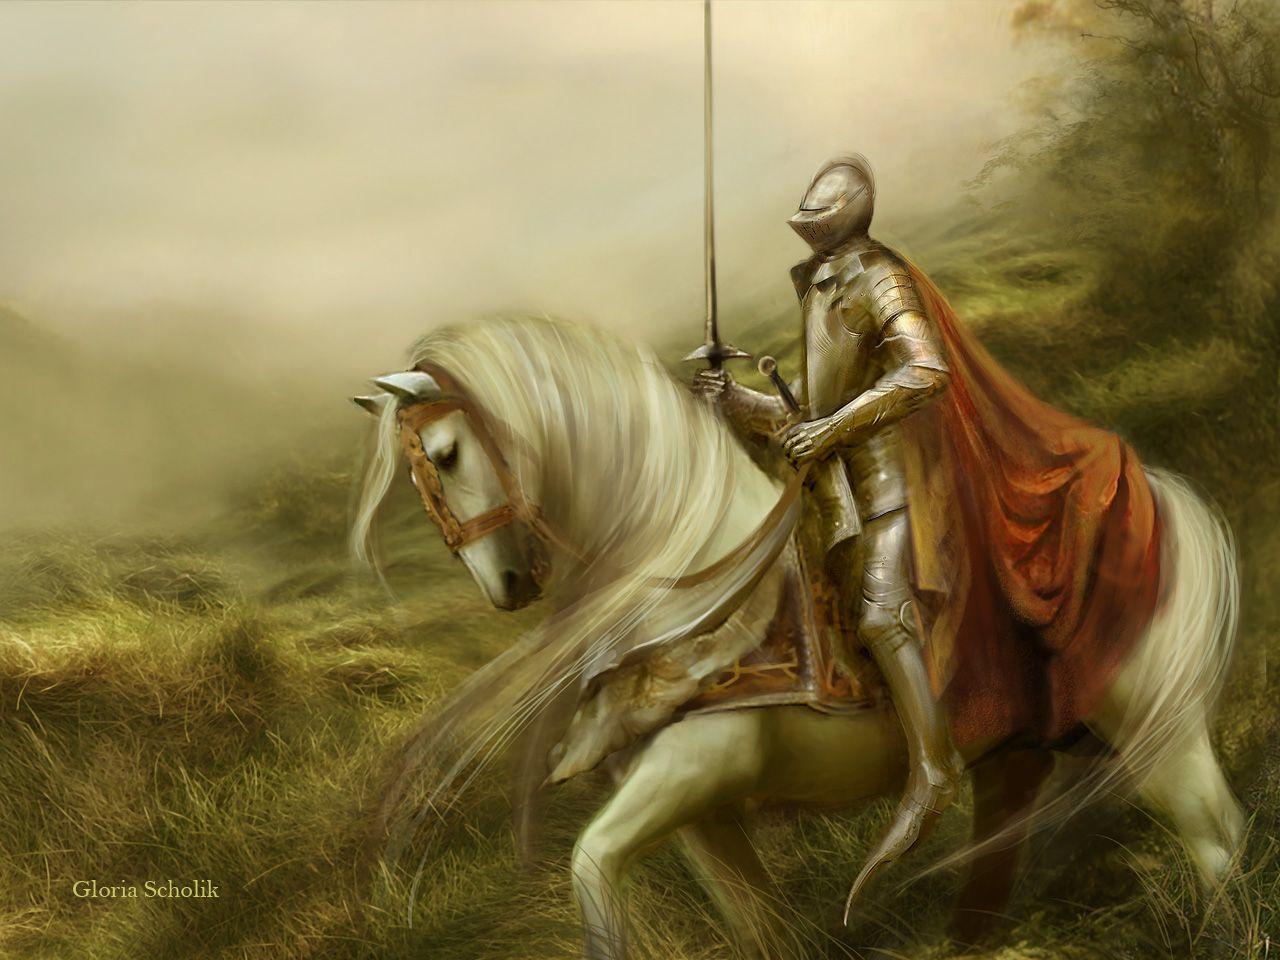 caballeros de epoca medieval - | BATALLAS HISTÓRICAS | Pinterest ...